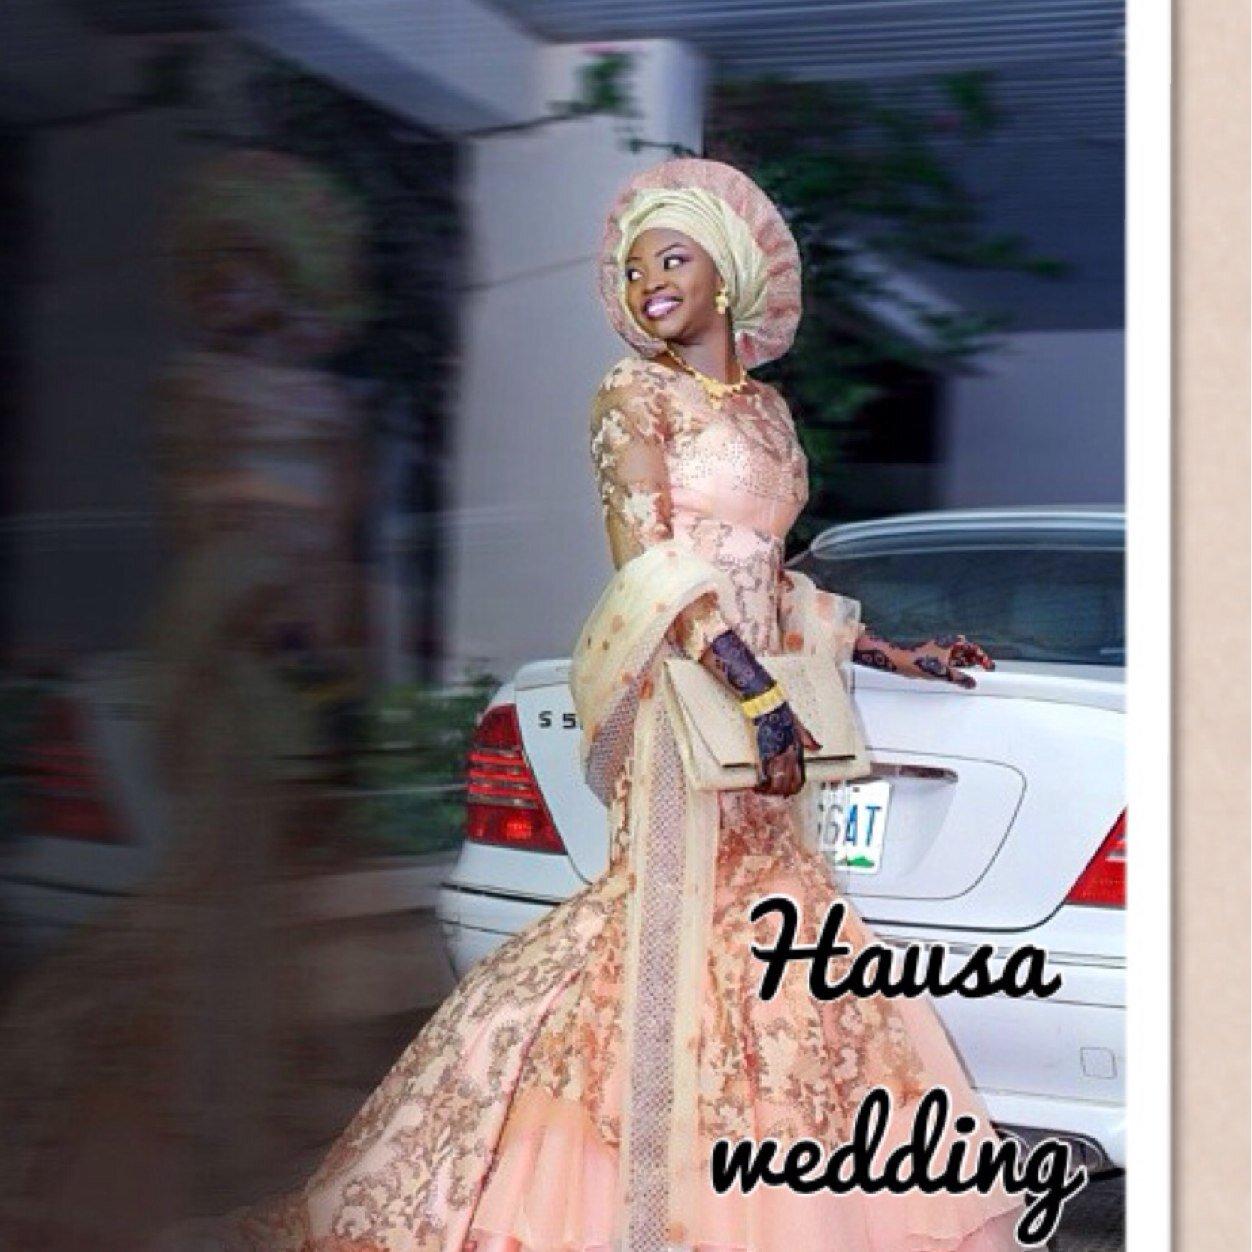 Hausa wedding wedding hausa twitter